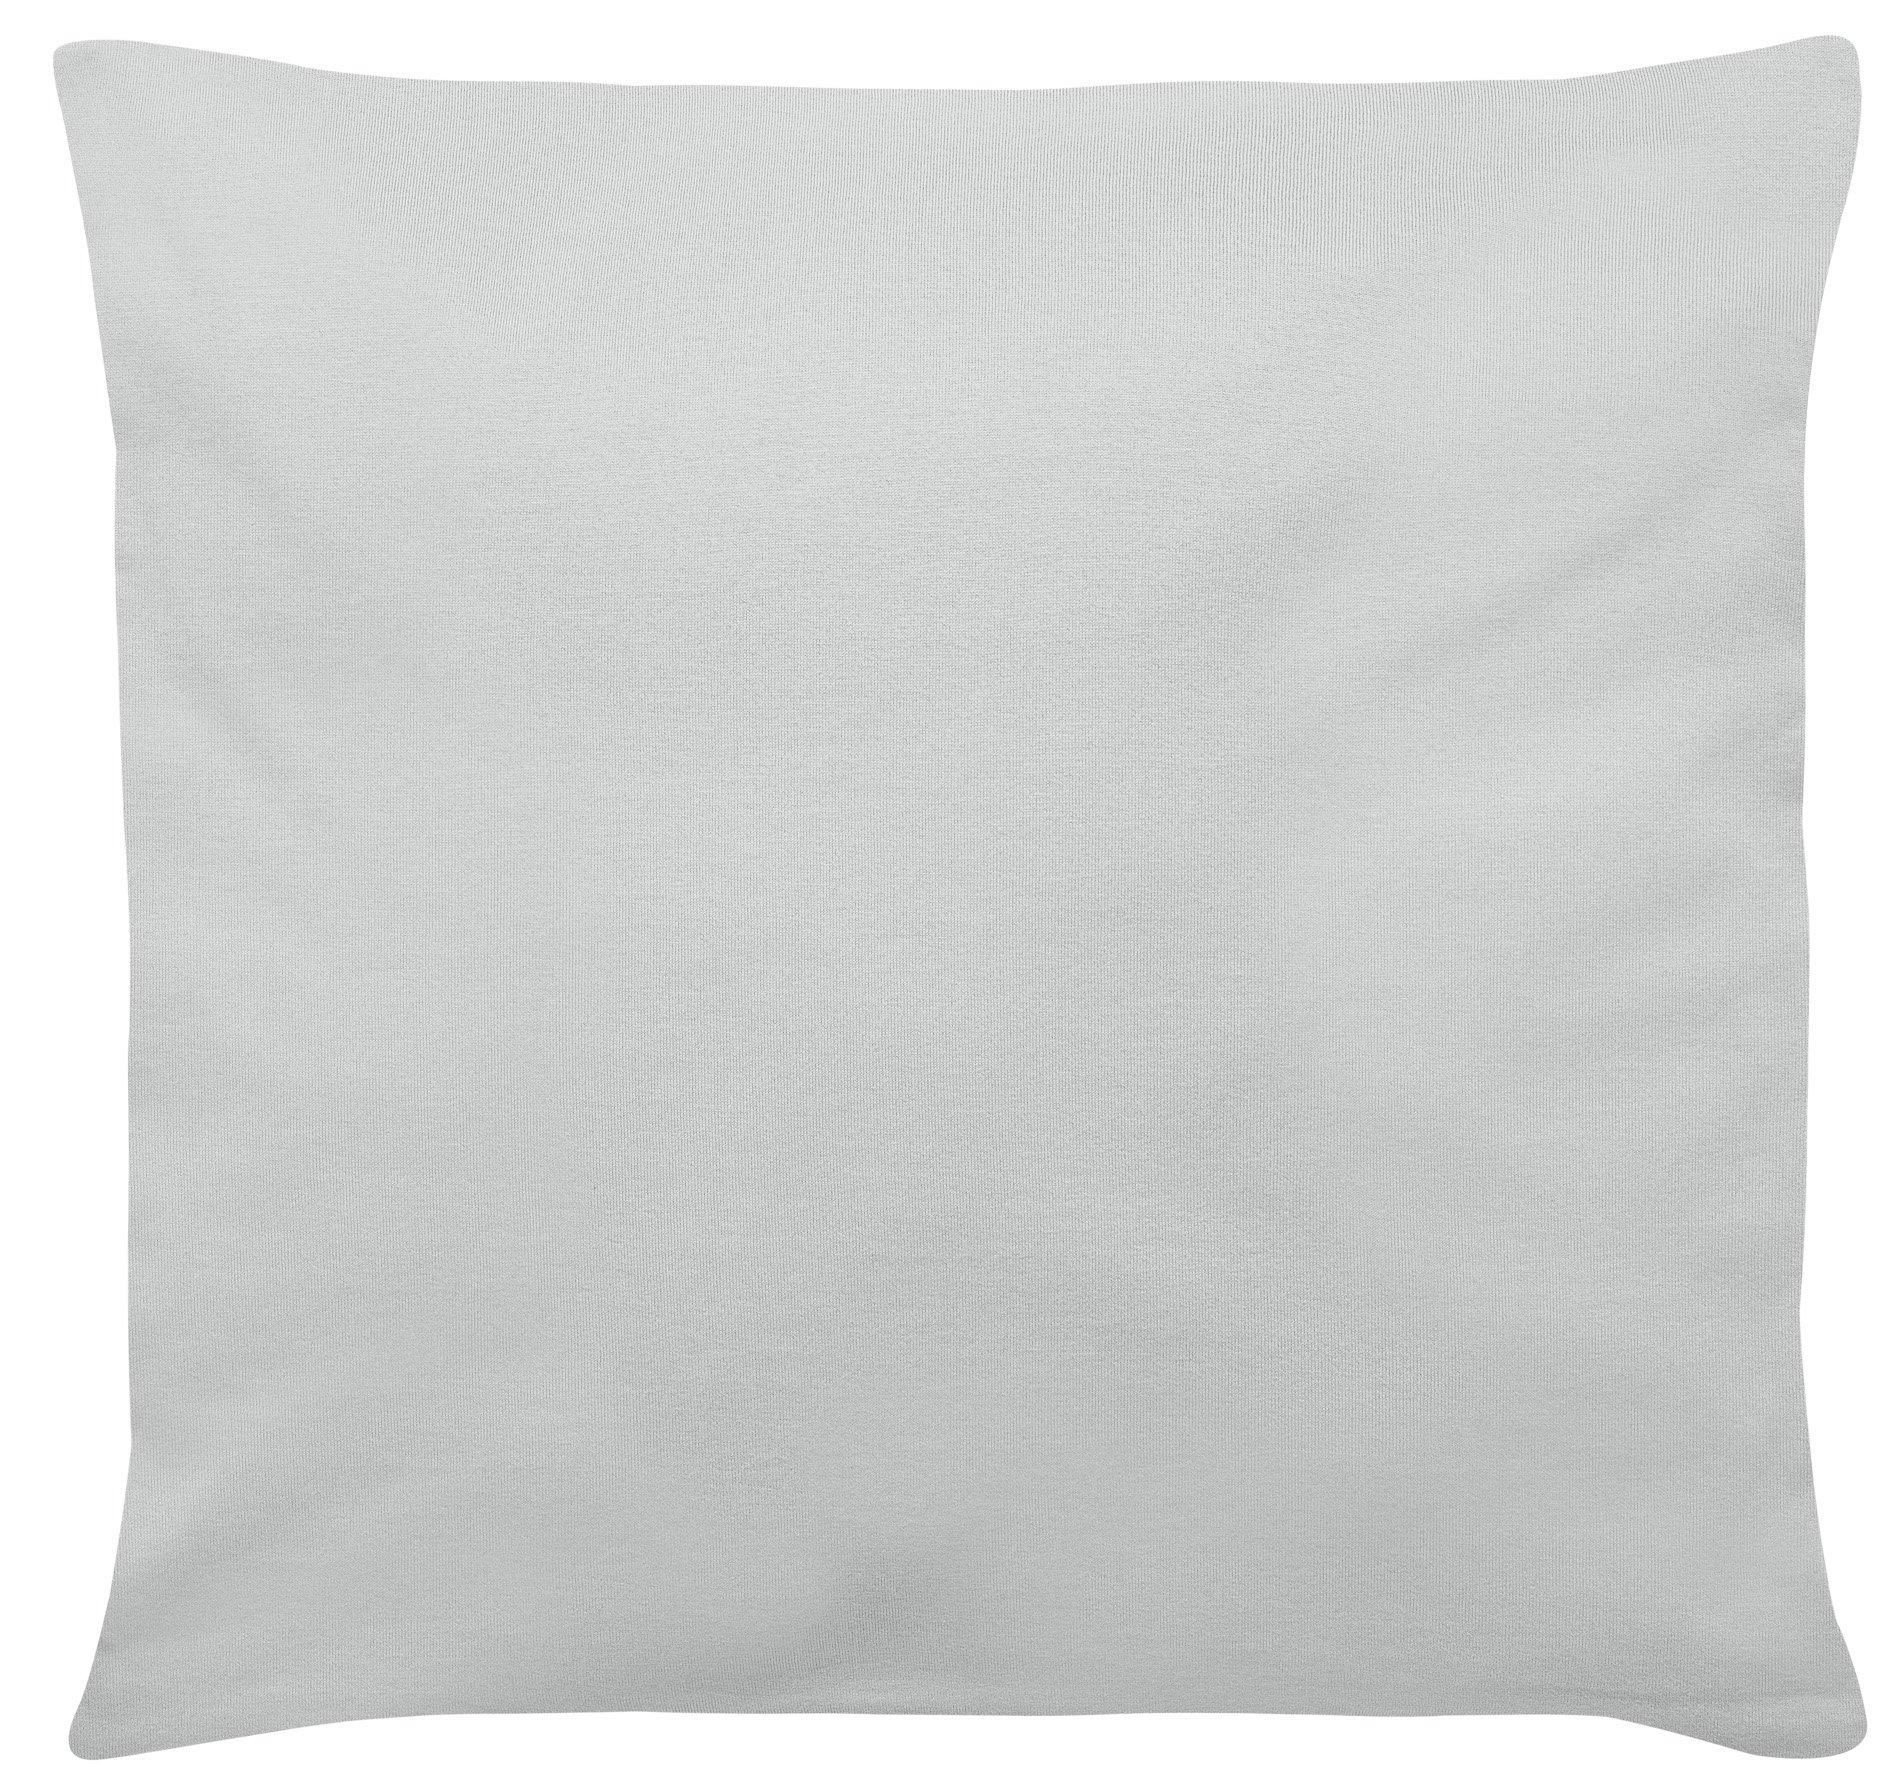 Edel-Zwirn-Jersey platin B40cm